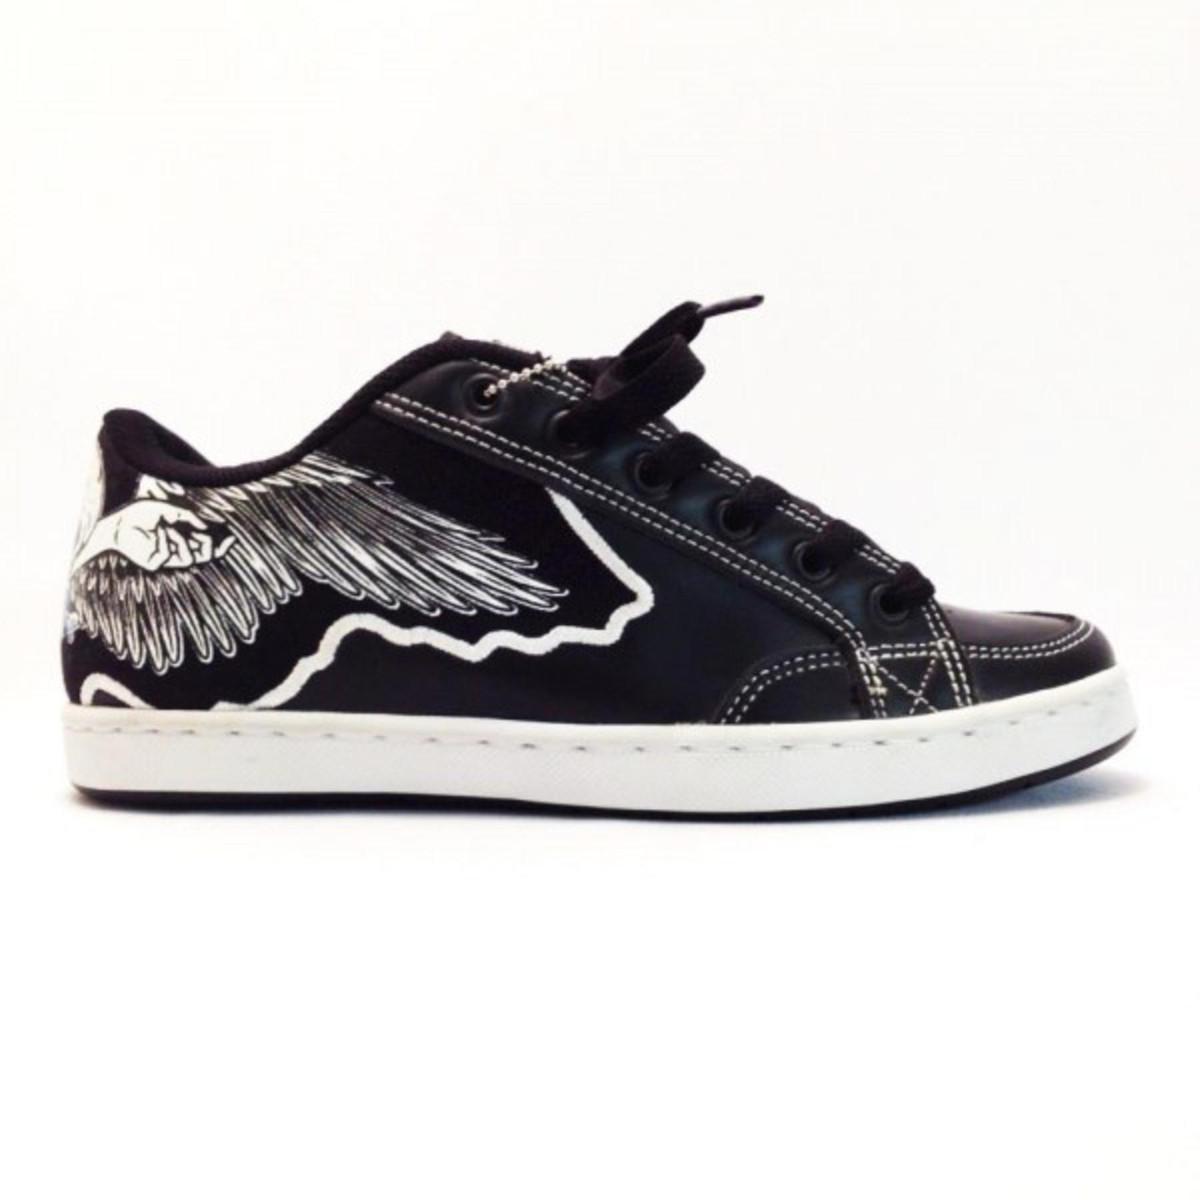 Osiris Skateboard Schuhe Hybrid schwarz  Weiß Turnschuhe schuhe